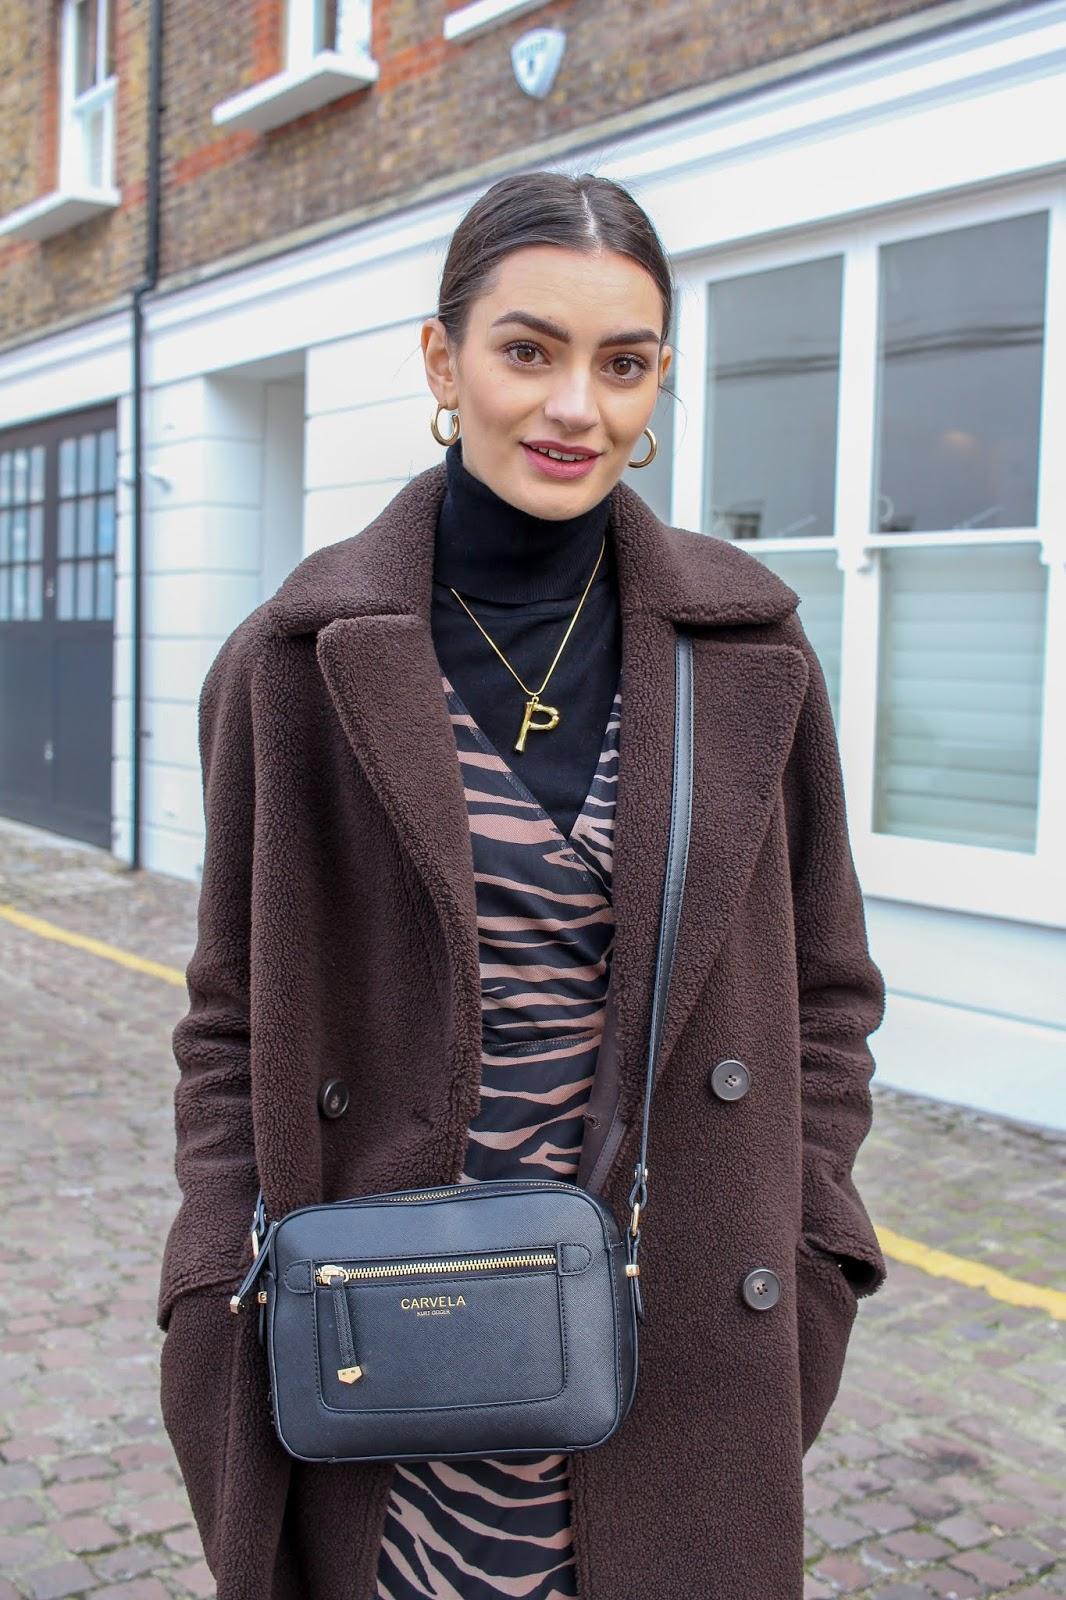 styling tiger print dress day-to-night peexo